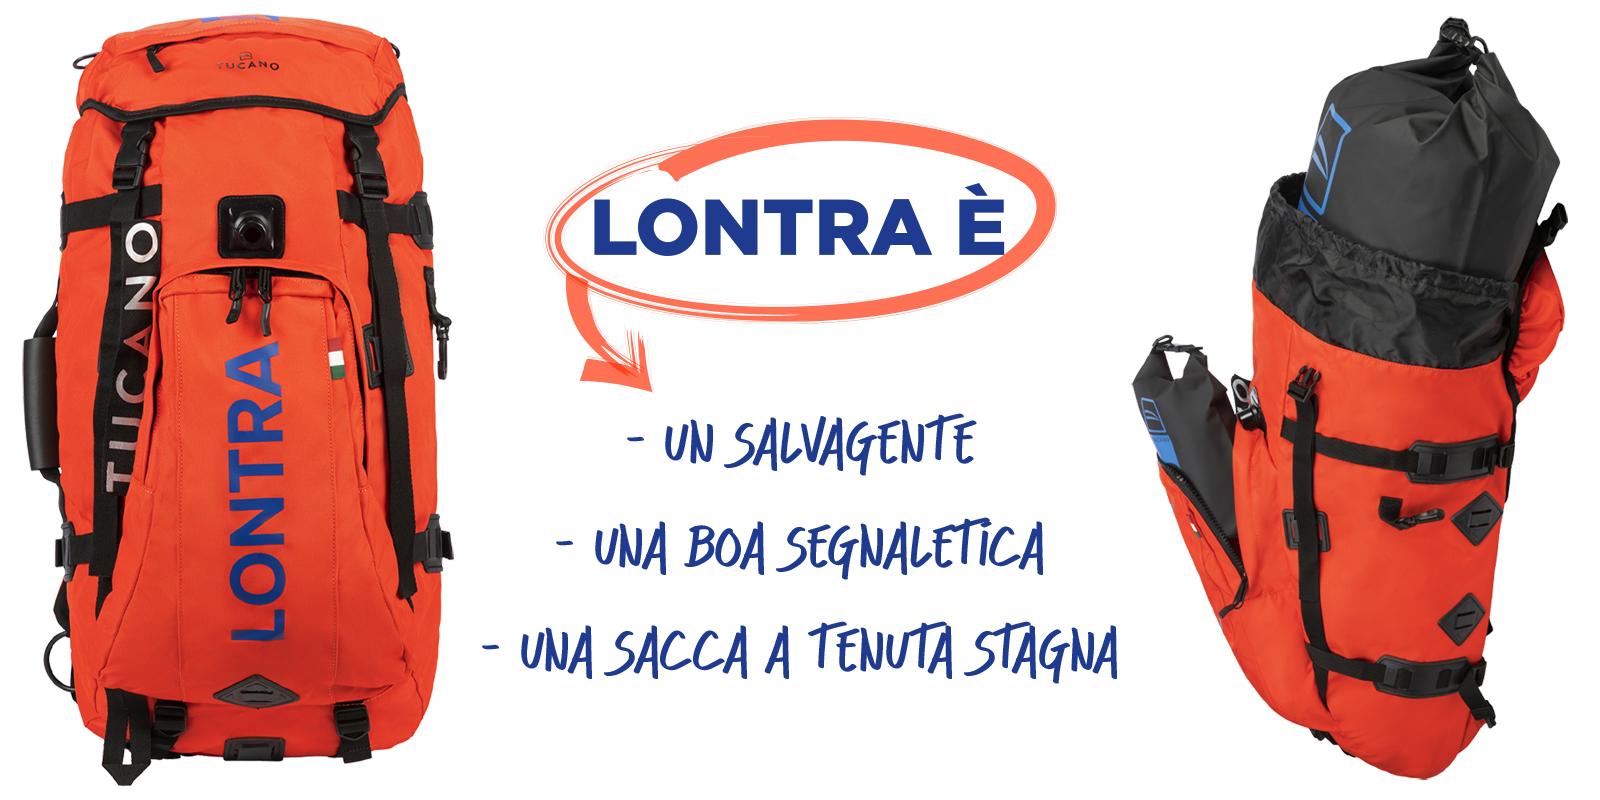 Lontra_salvagente_boa_segnaletica_sacca_stagna